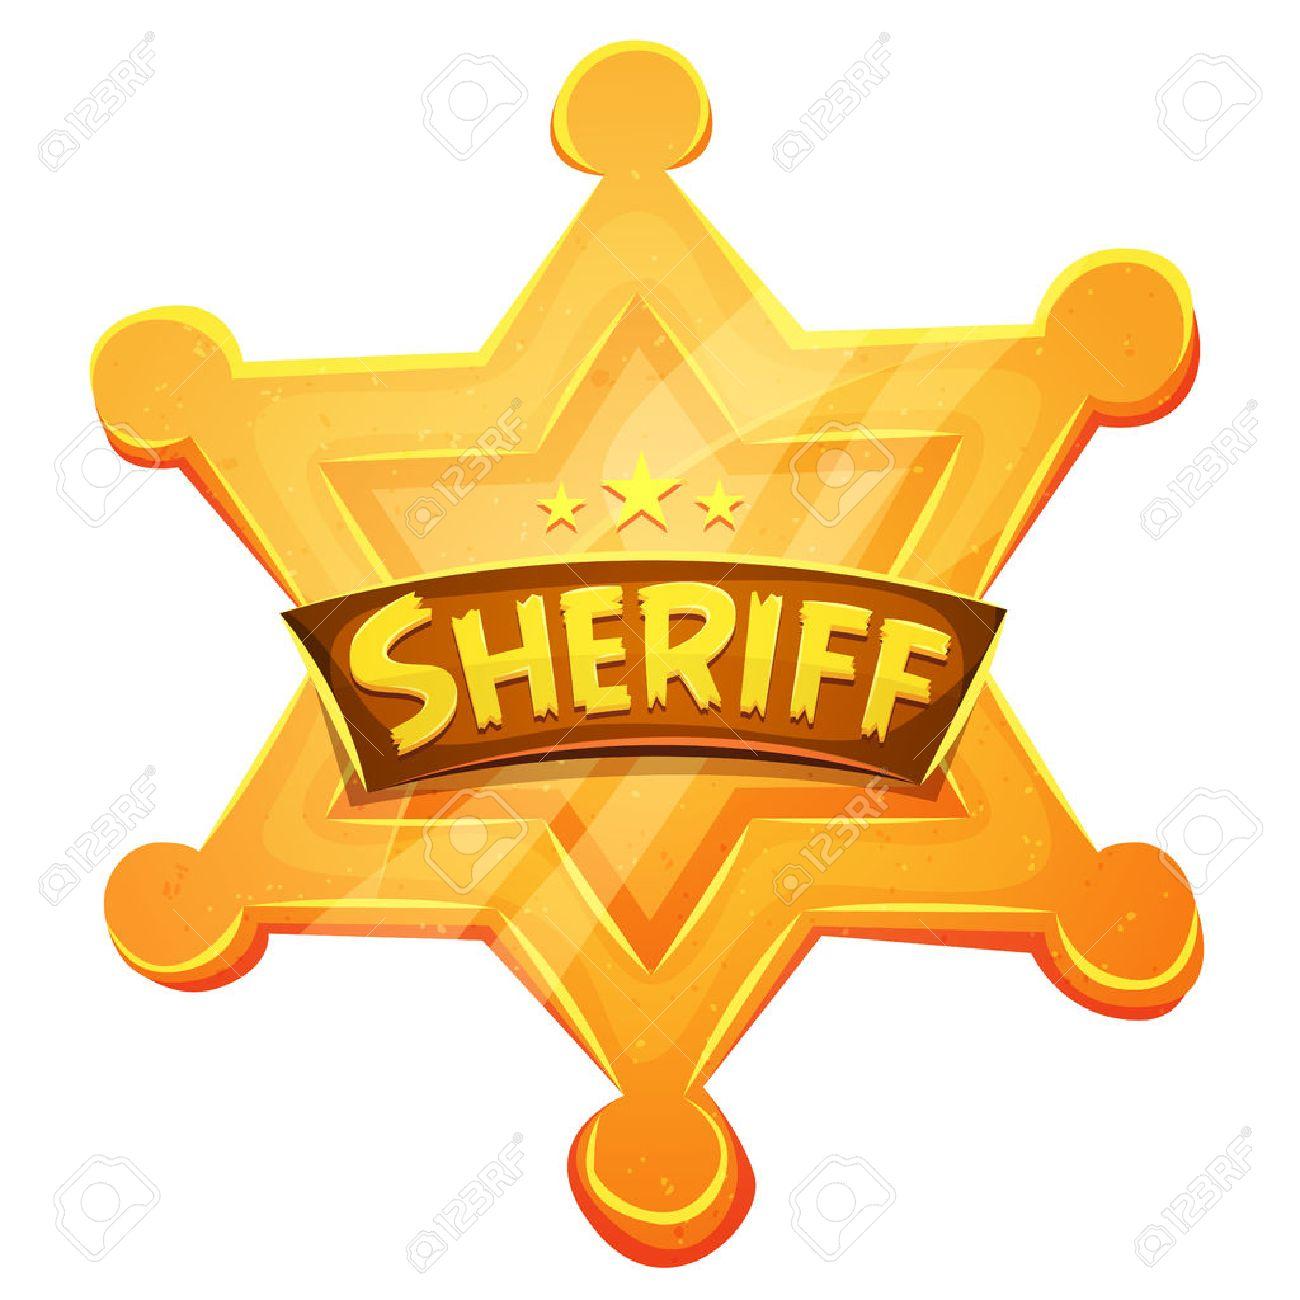 Illustration Of A Cartoon Funny Golden Sheriff Medal Symbol For